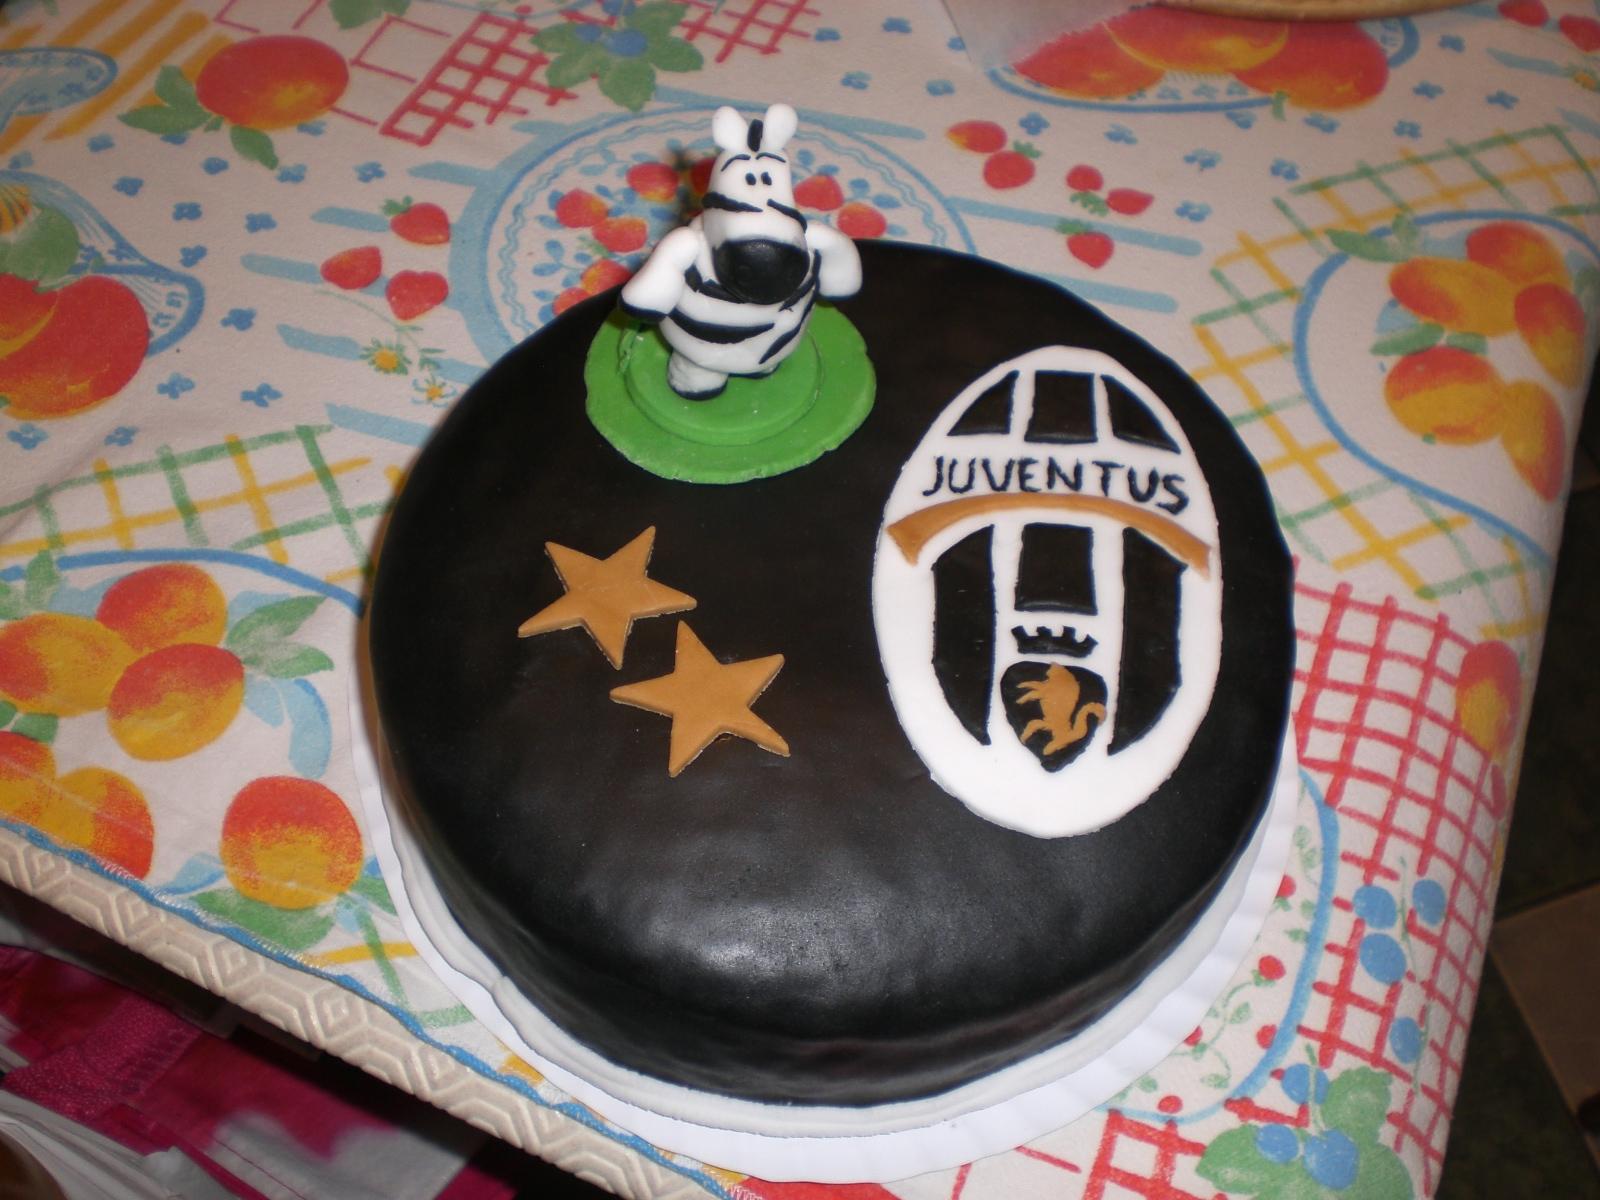 I Love Cake Design Fiorella : Cake Design di Fiorella: Torta Juventus